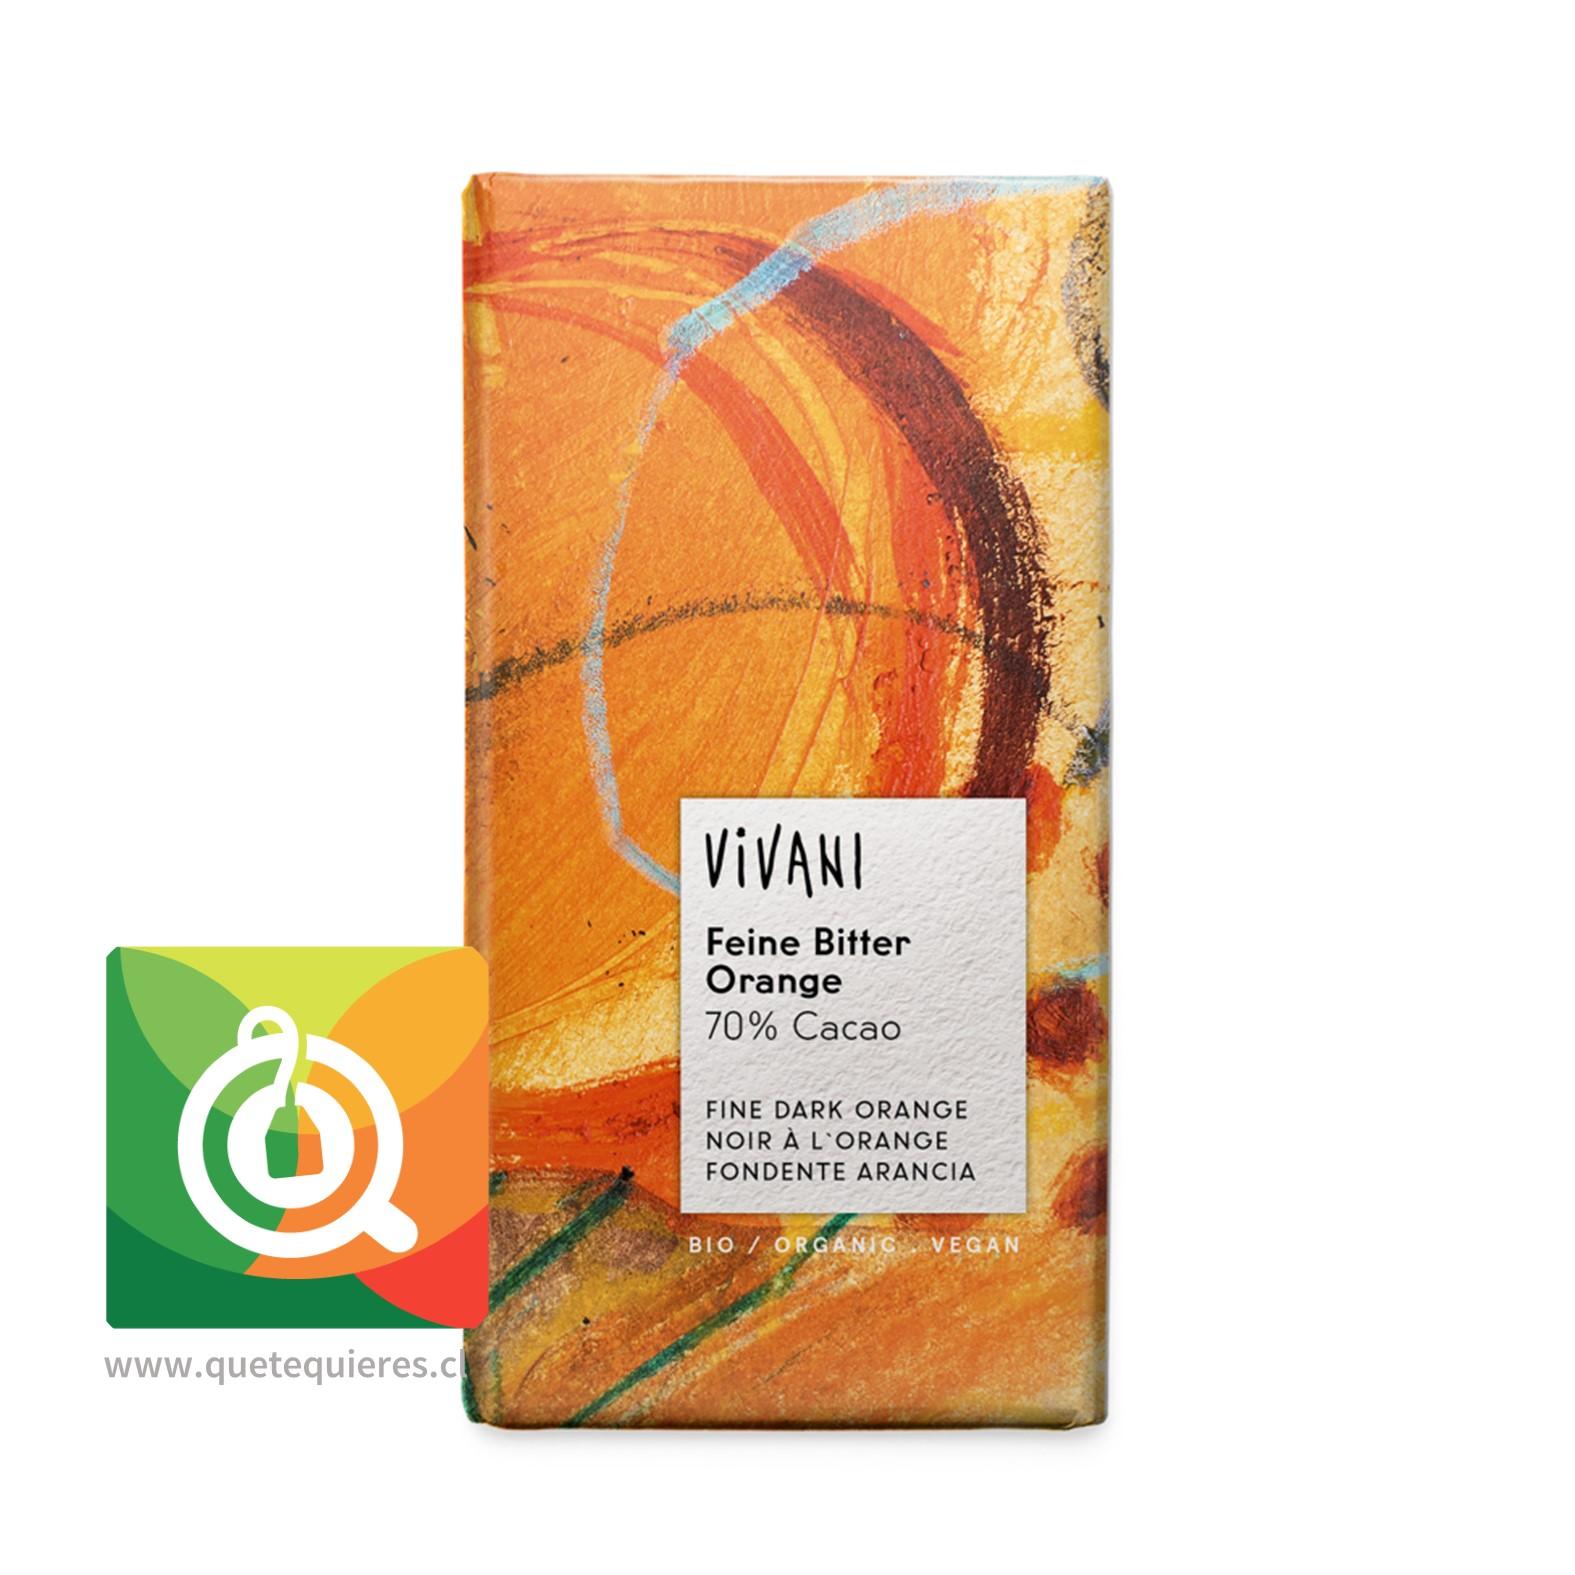 Vivani Chocolate Barra Naranja 70% Cacao / Vegano